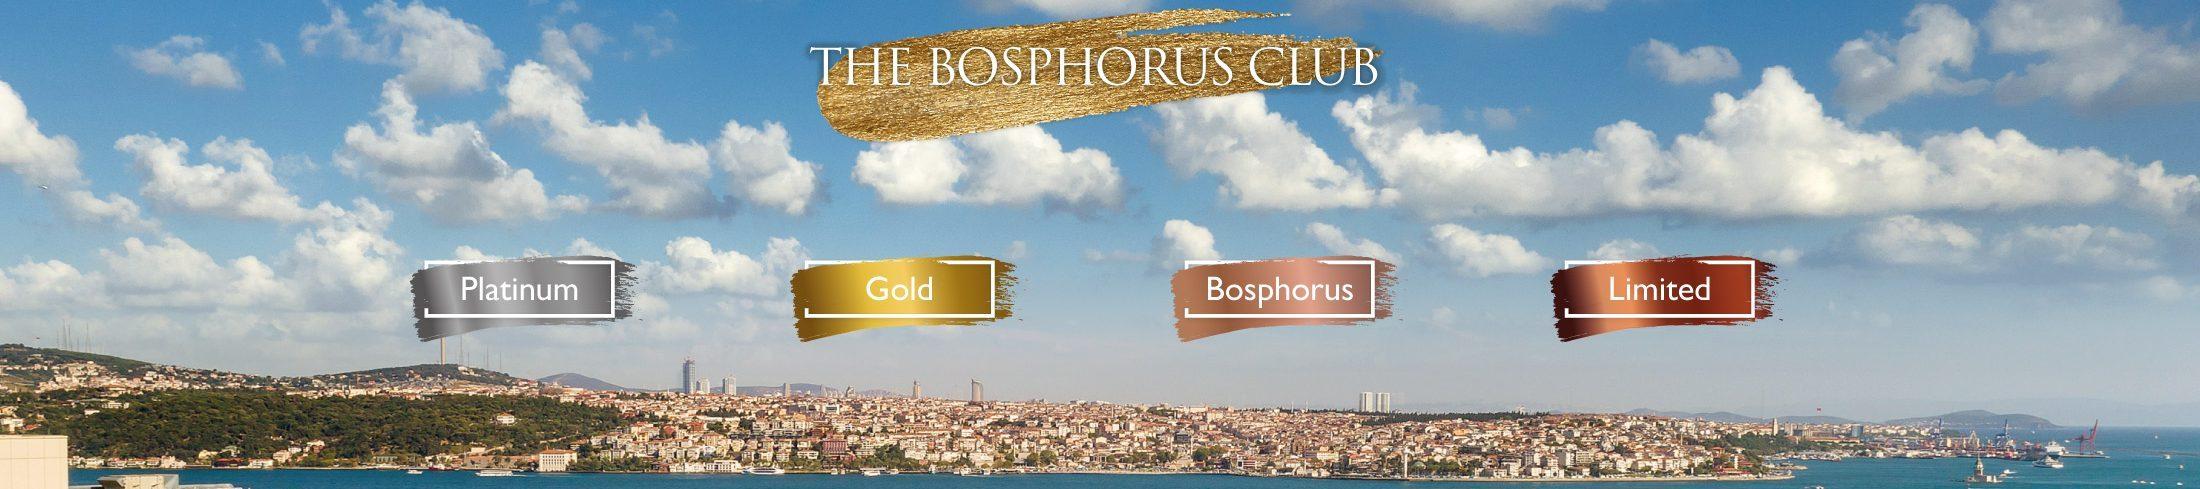 the_bosphorus_club_genel_2200x1200-2